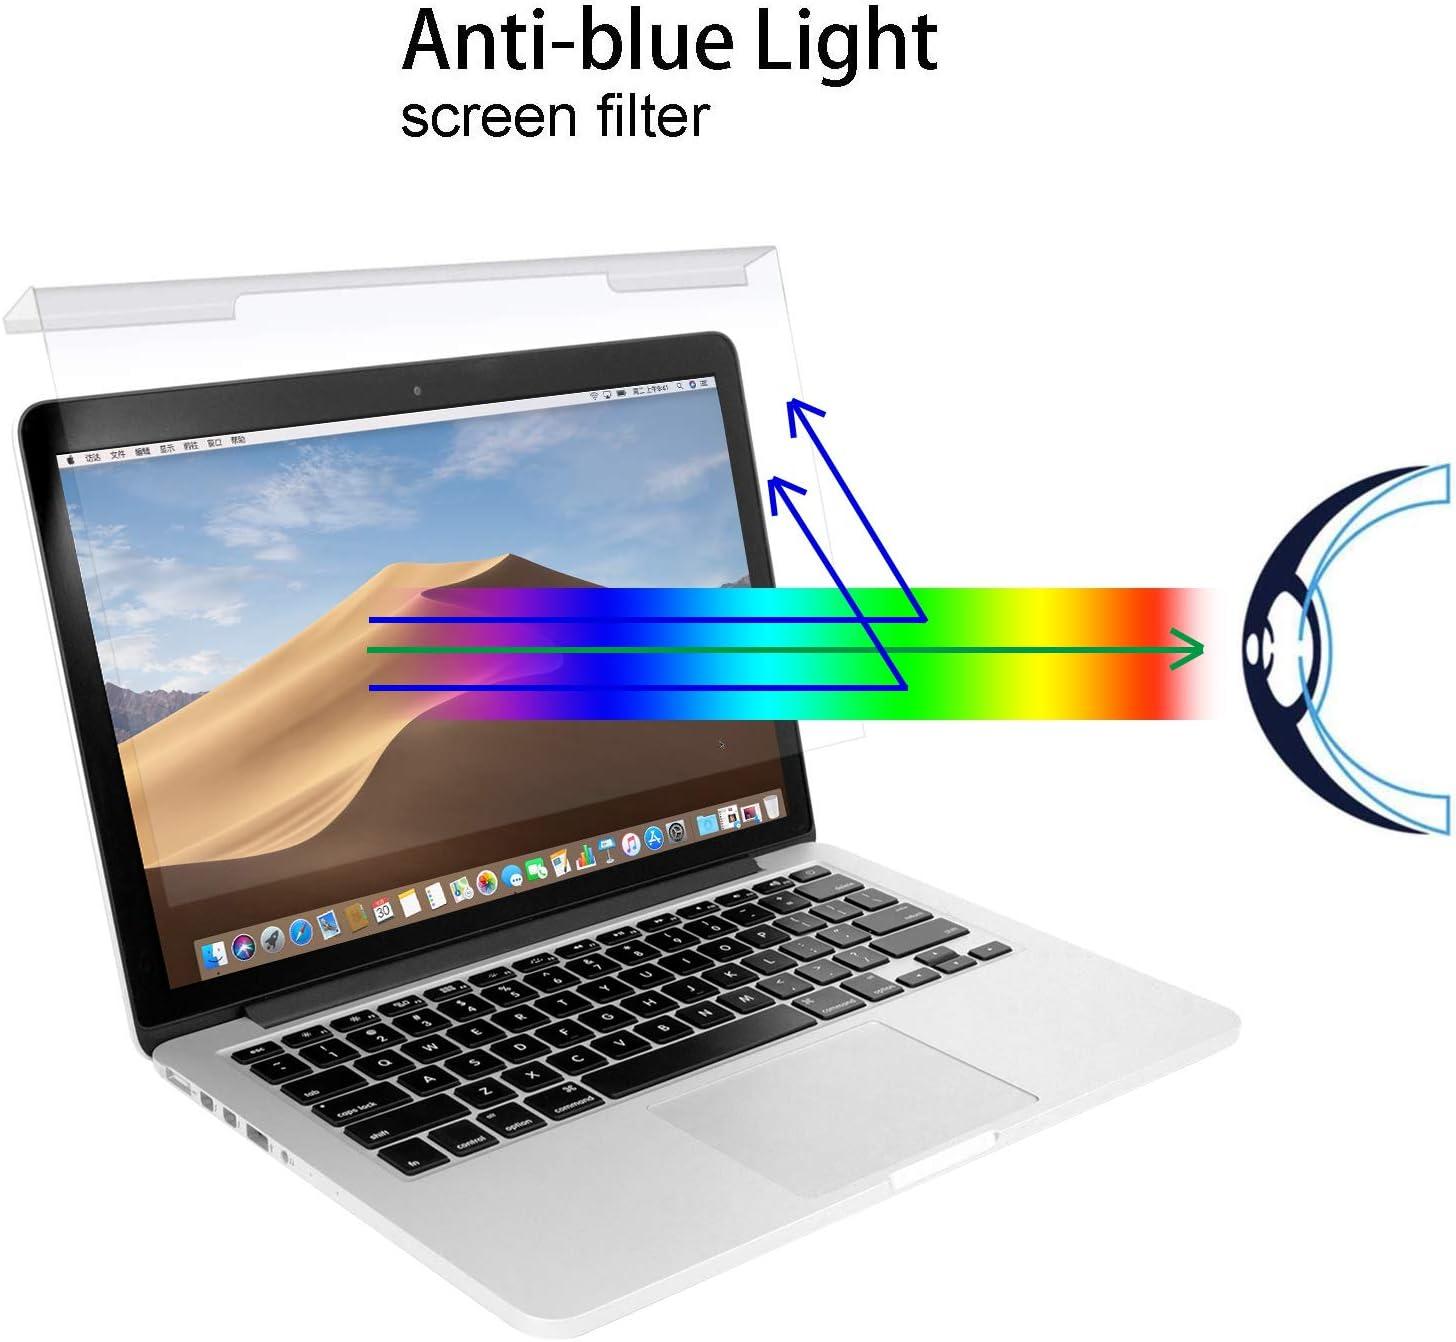 Monitor Anti-Scratch BOZABOZA Anti-Glare LCD Notebook MacBook Pro Anti-Blue Ray Privacy Screen Filter Matte or Gloss Privacy Protector for Laptop Display 254 x 145 11